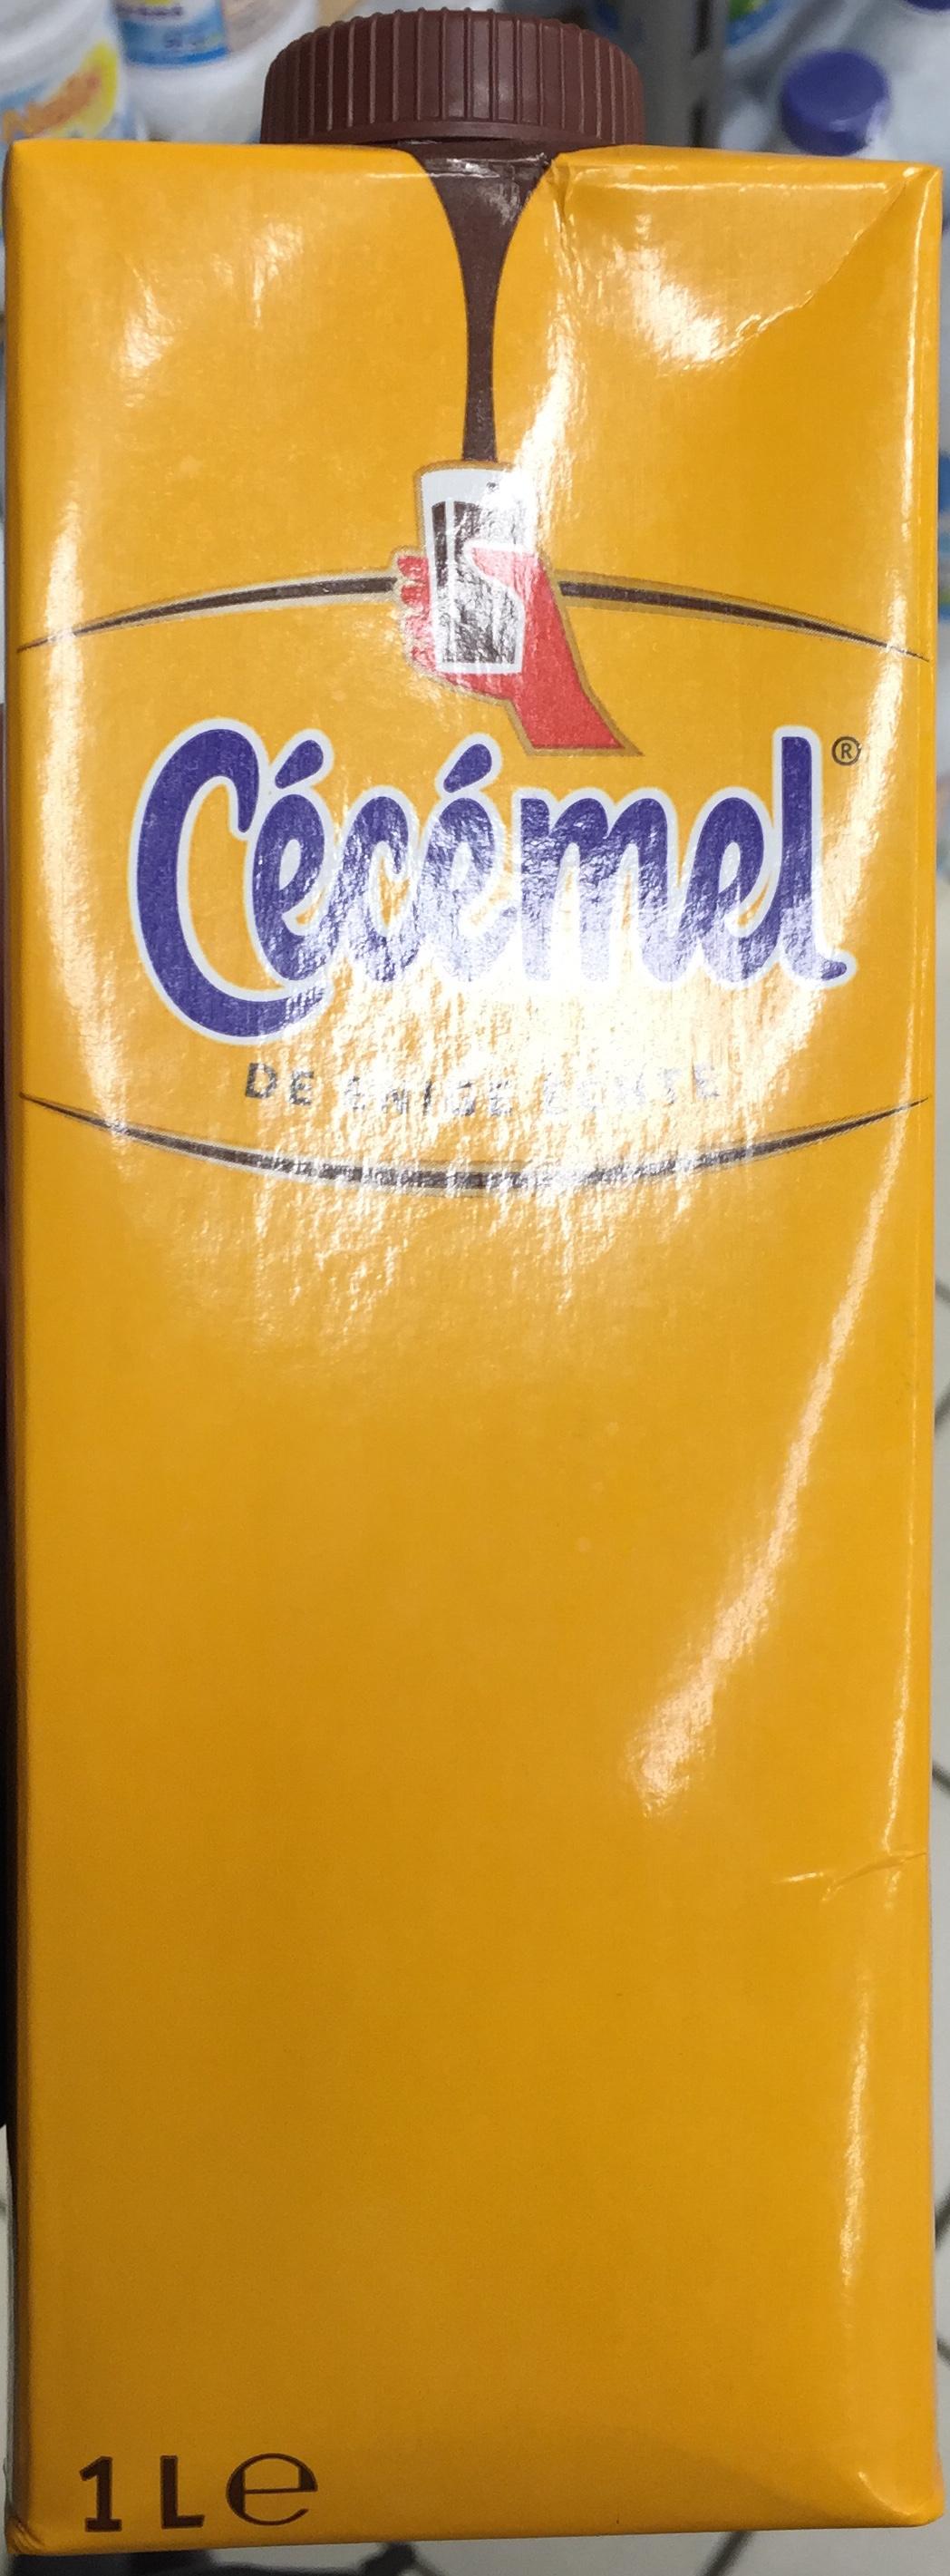 Cécémel - Product